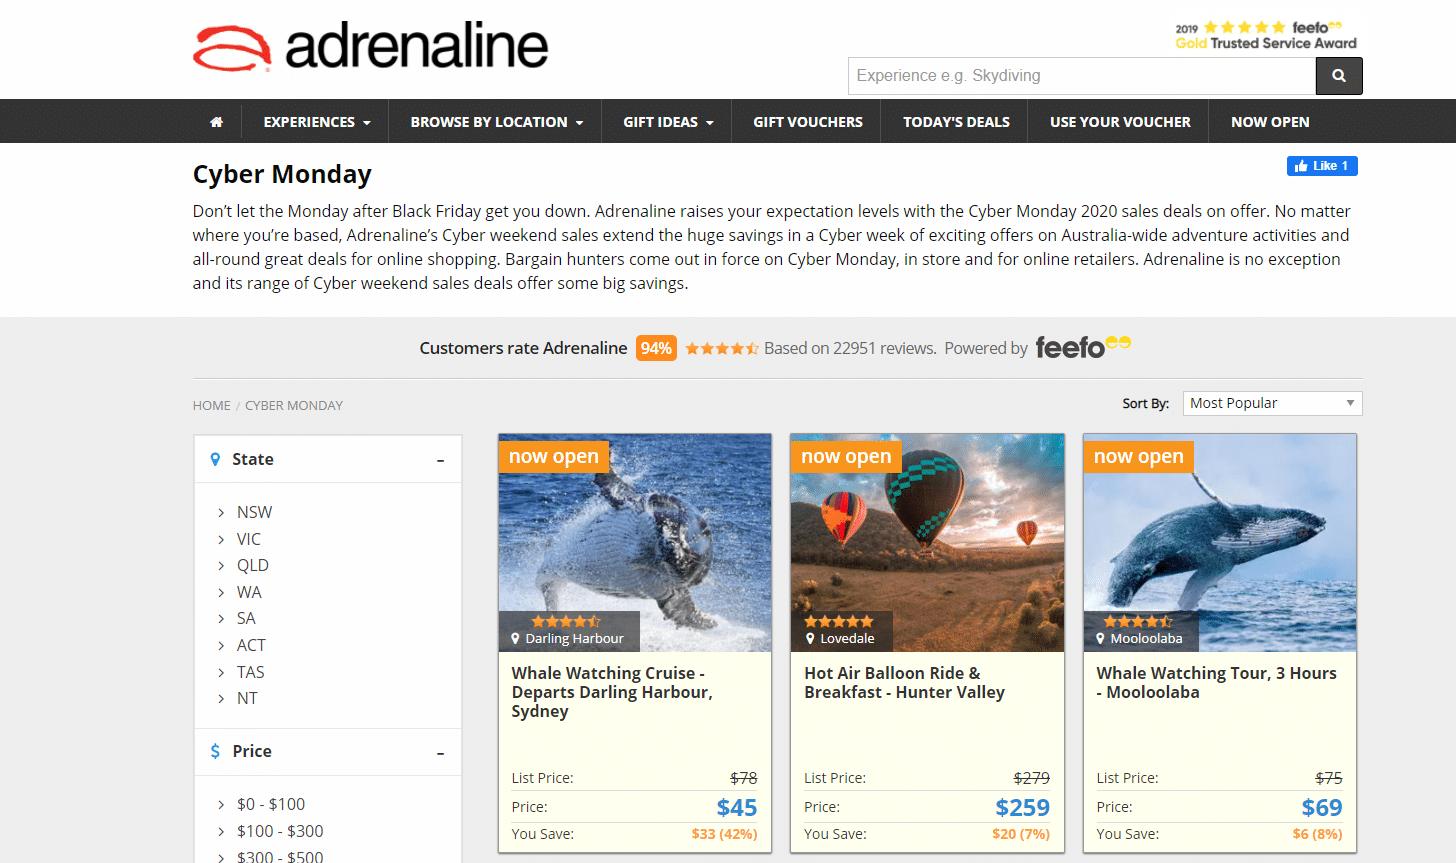 Adrenaline Cyber Monday Deals